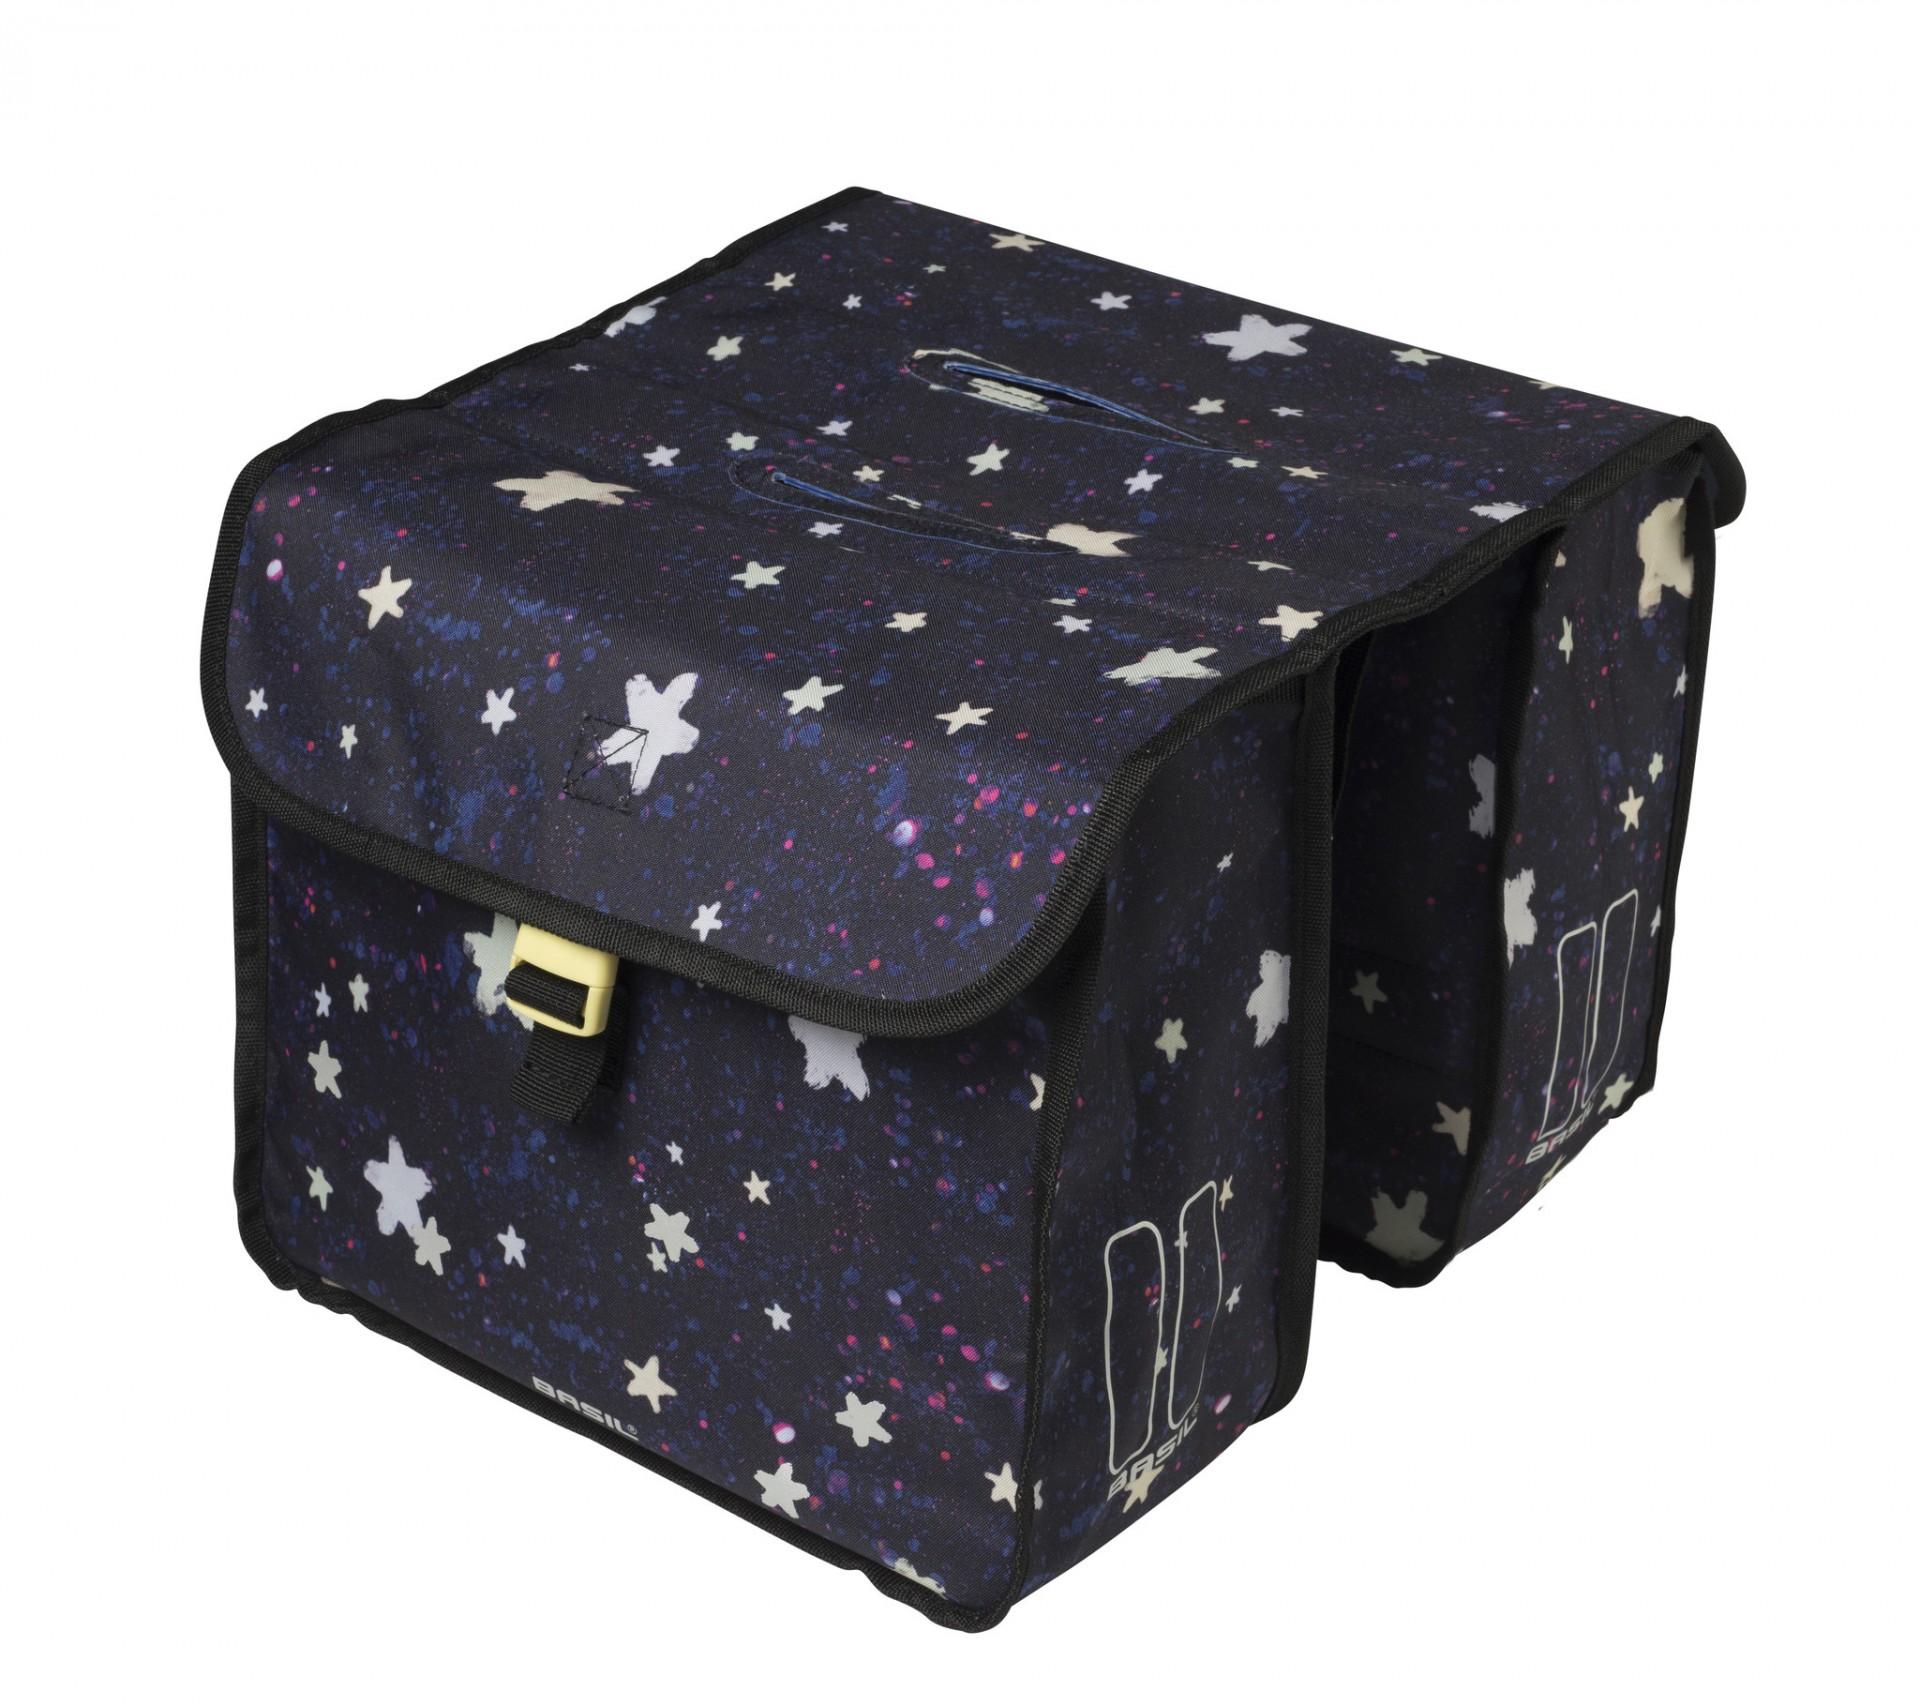 Basil Stardust - Double Bag - 20L - Nightshade